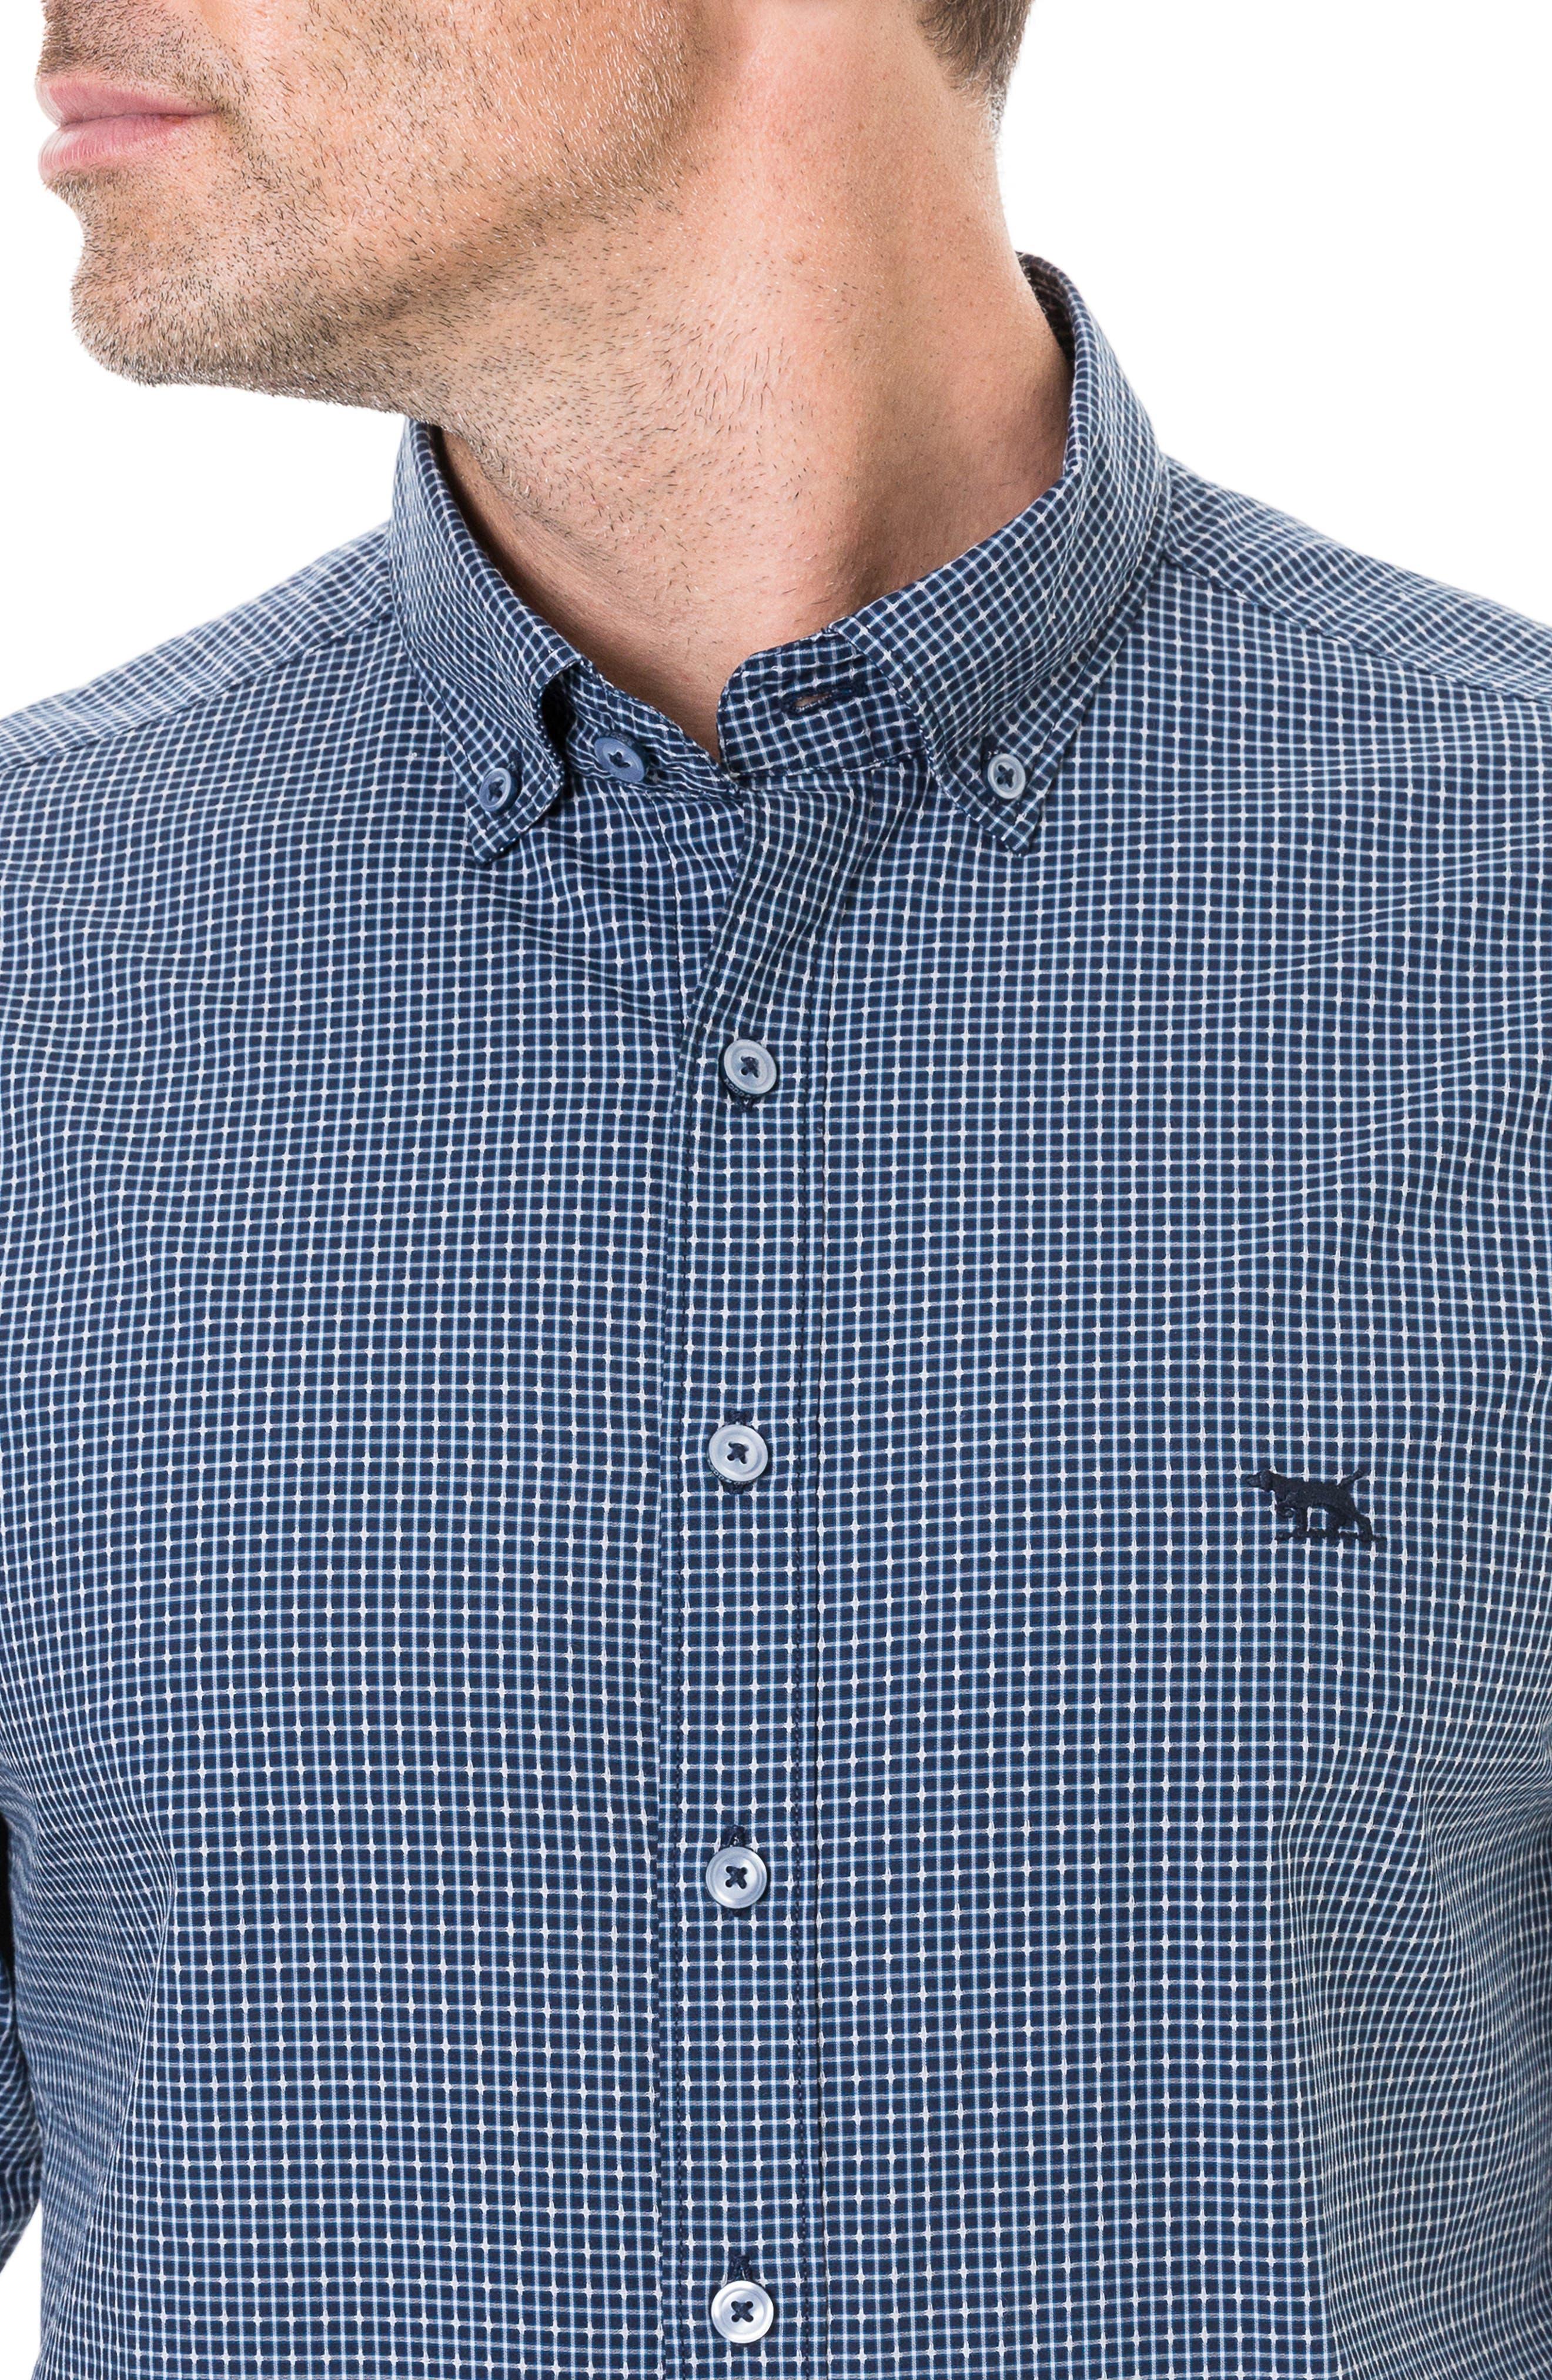 Wingrove Regular Fit Sport Shirt,                             Alternate thumbnail 5, color,                             MIDNIGHT